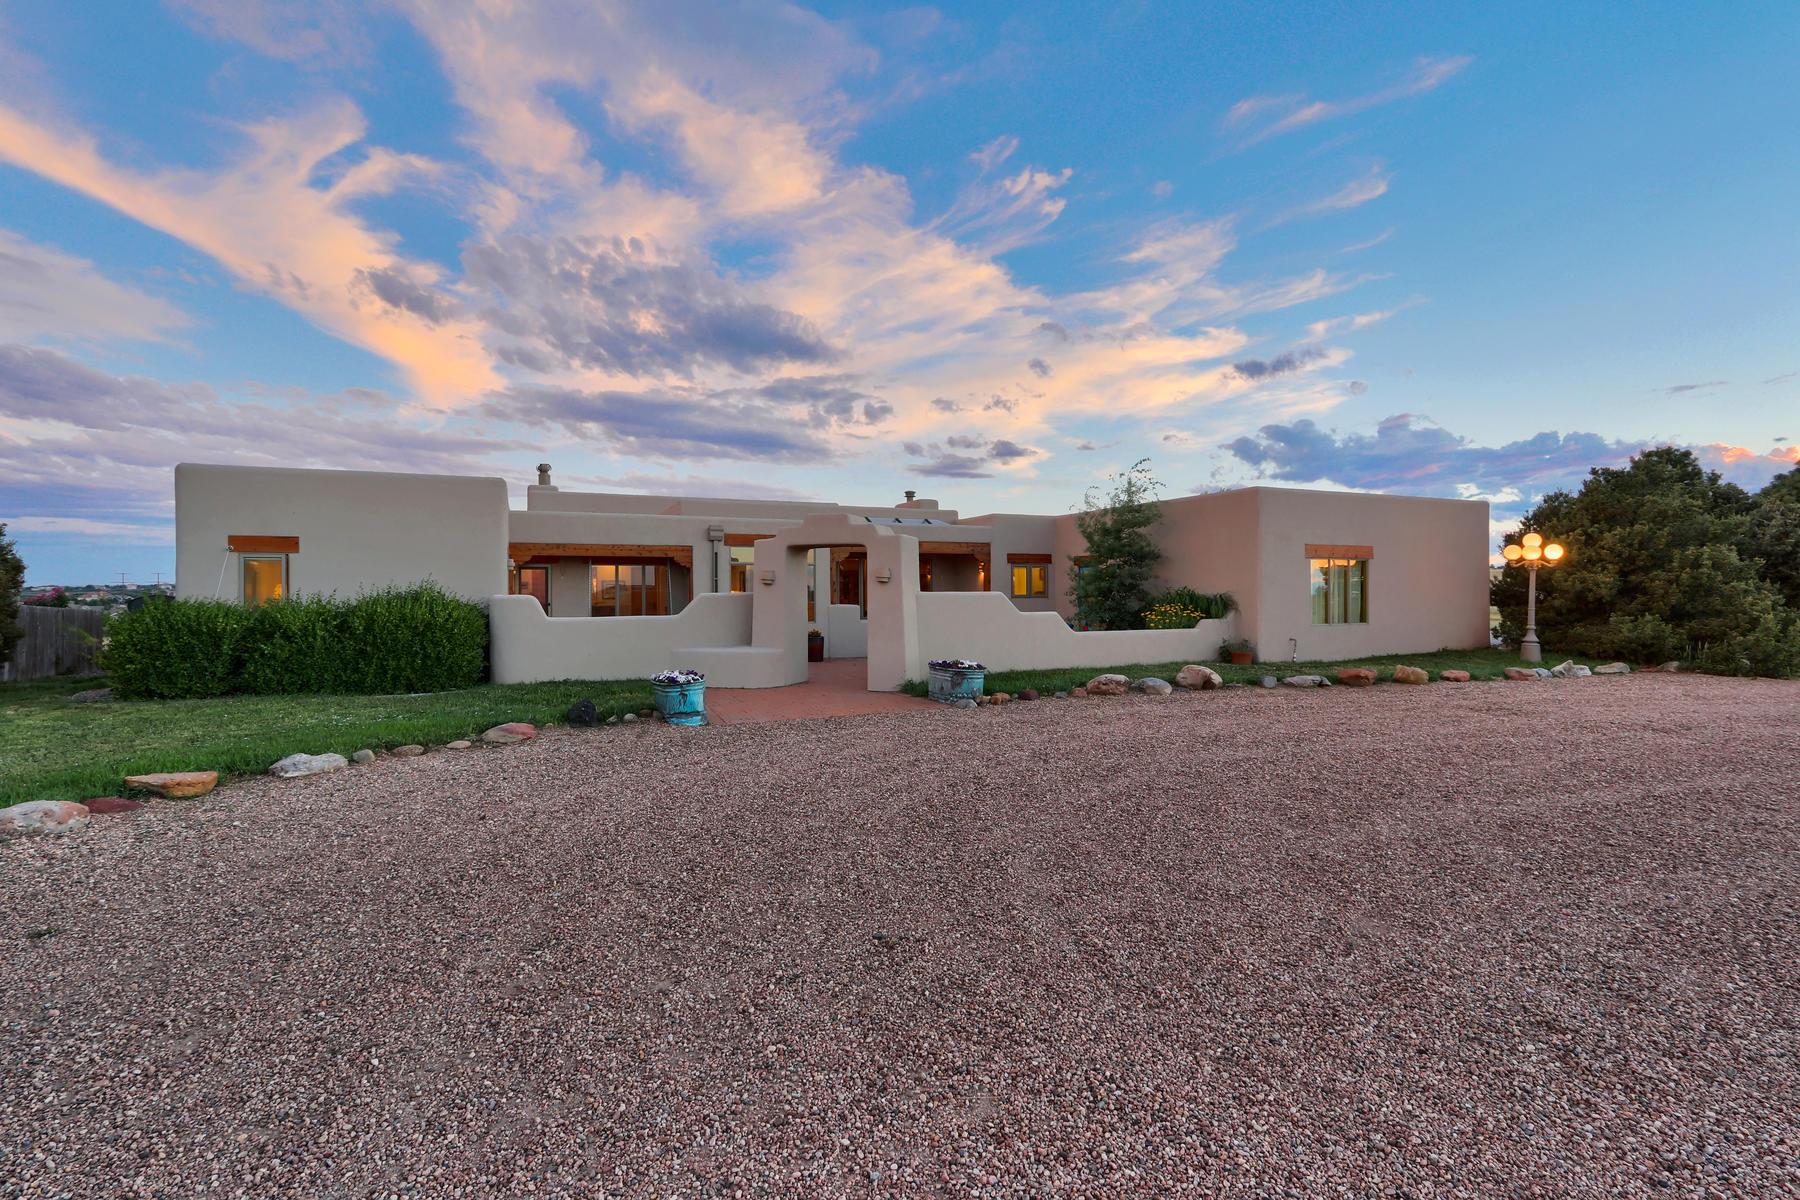 Single Family Homes のために 売買 アット 35 Acres of Equestrian Tranquility 1764 Mesa Ridge Lane, Castle Rock, コロラド 80108 アメリカ